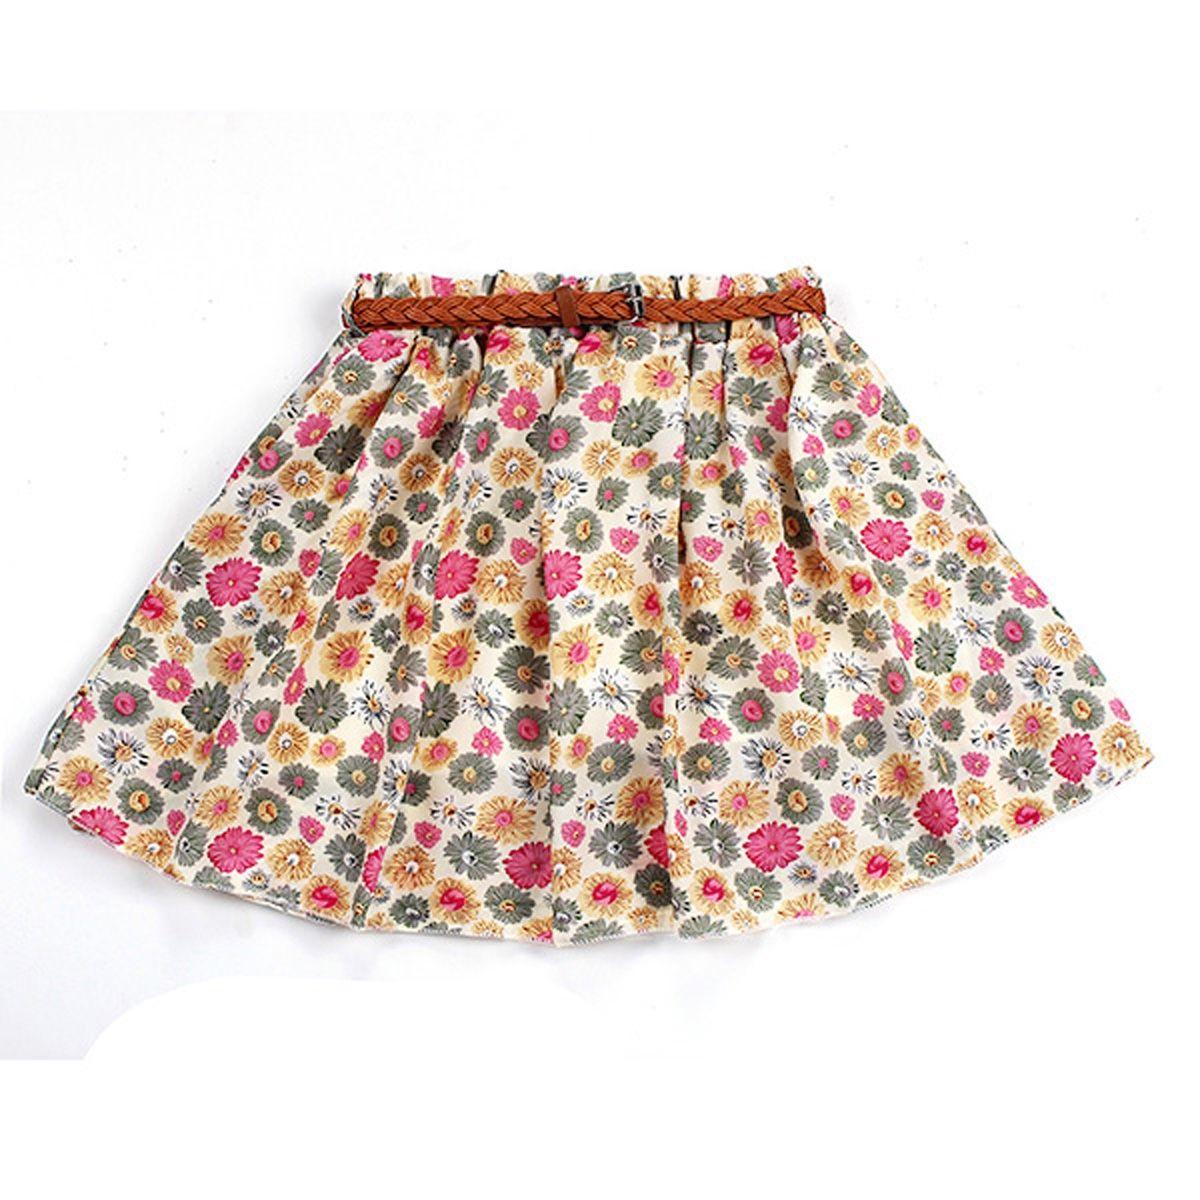 cb195cc07 Buy ZANZEA ZANZEA Ladies Short Mini High Waist Skirt Women Flared Pleated  Skirts Dress Pink Flower